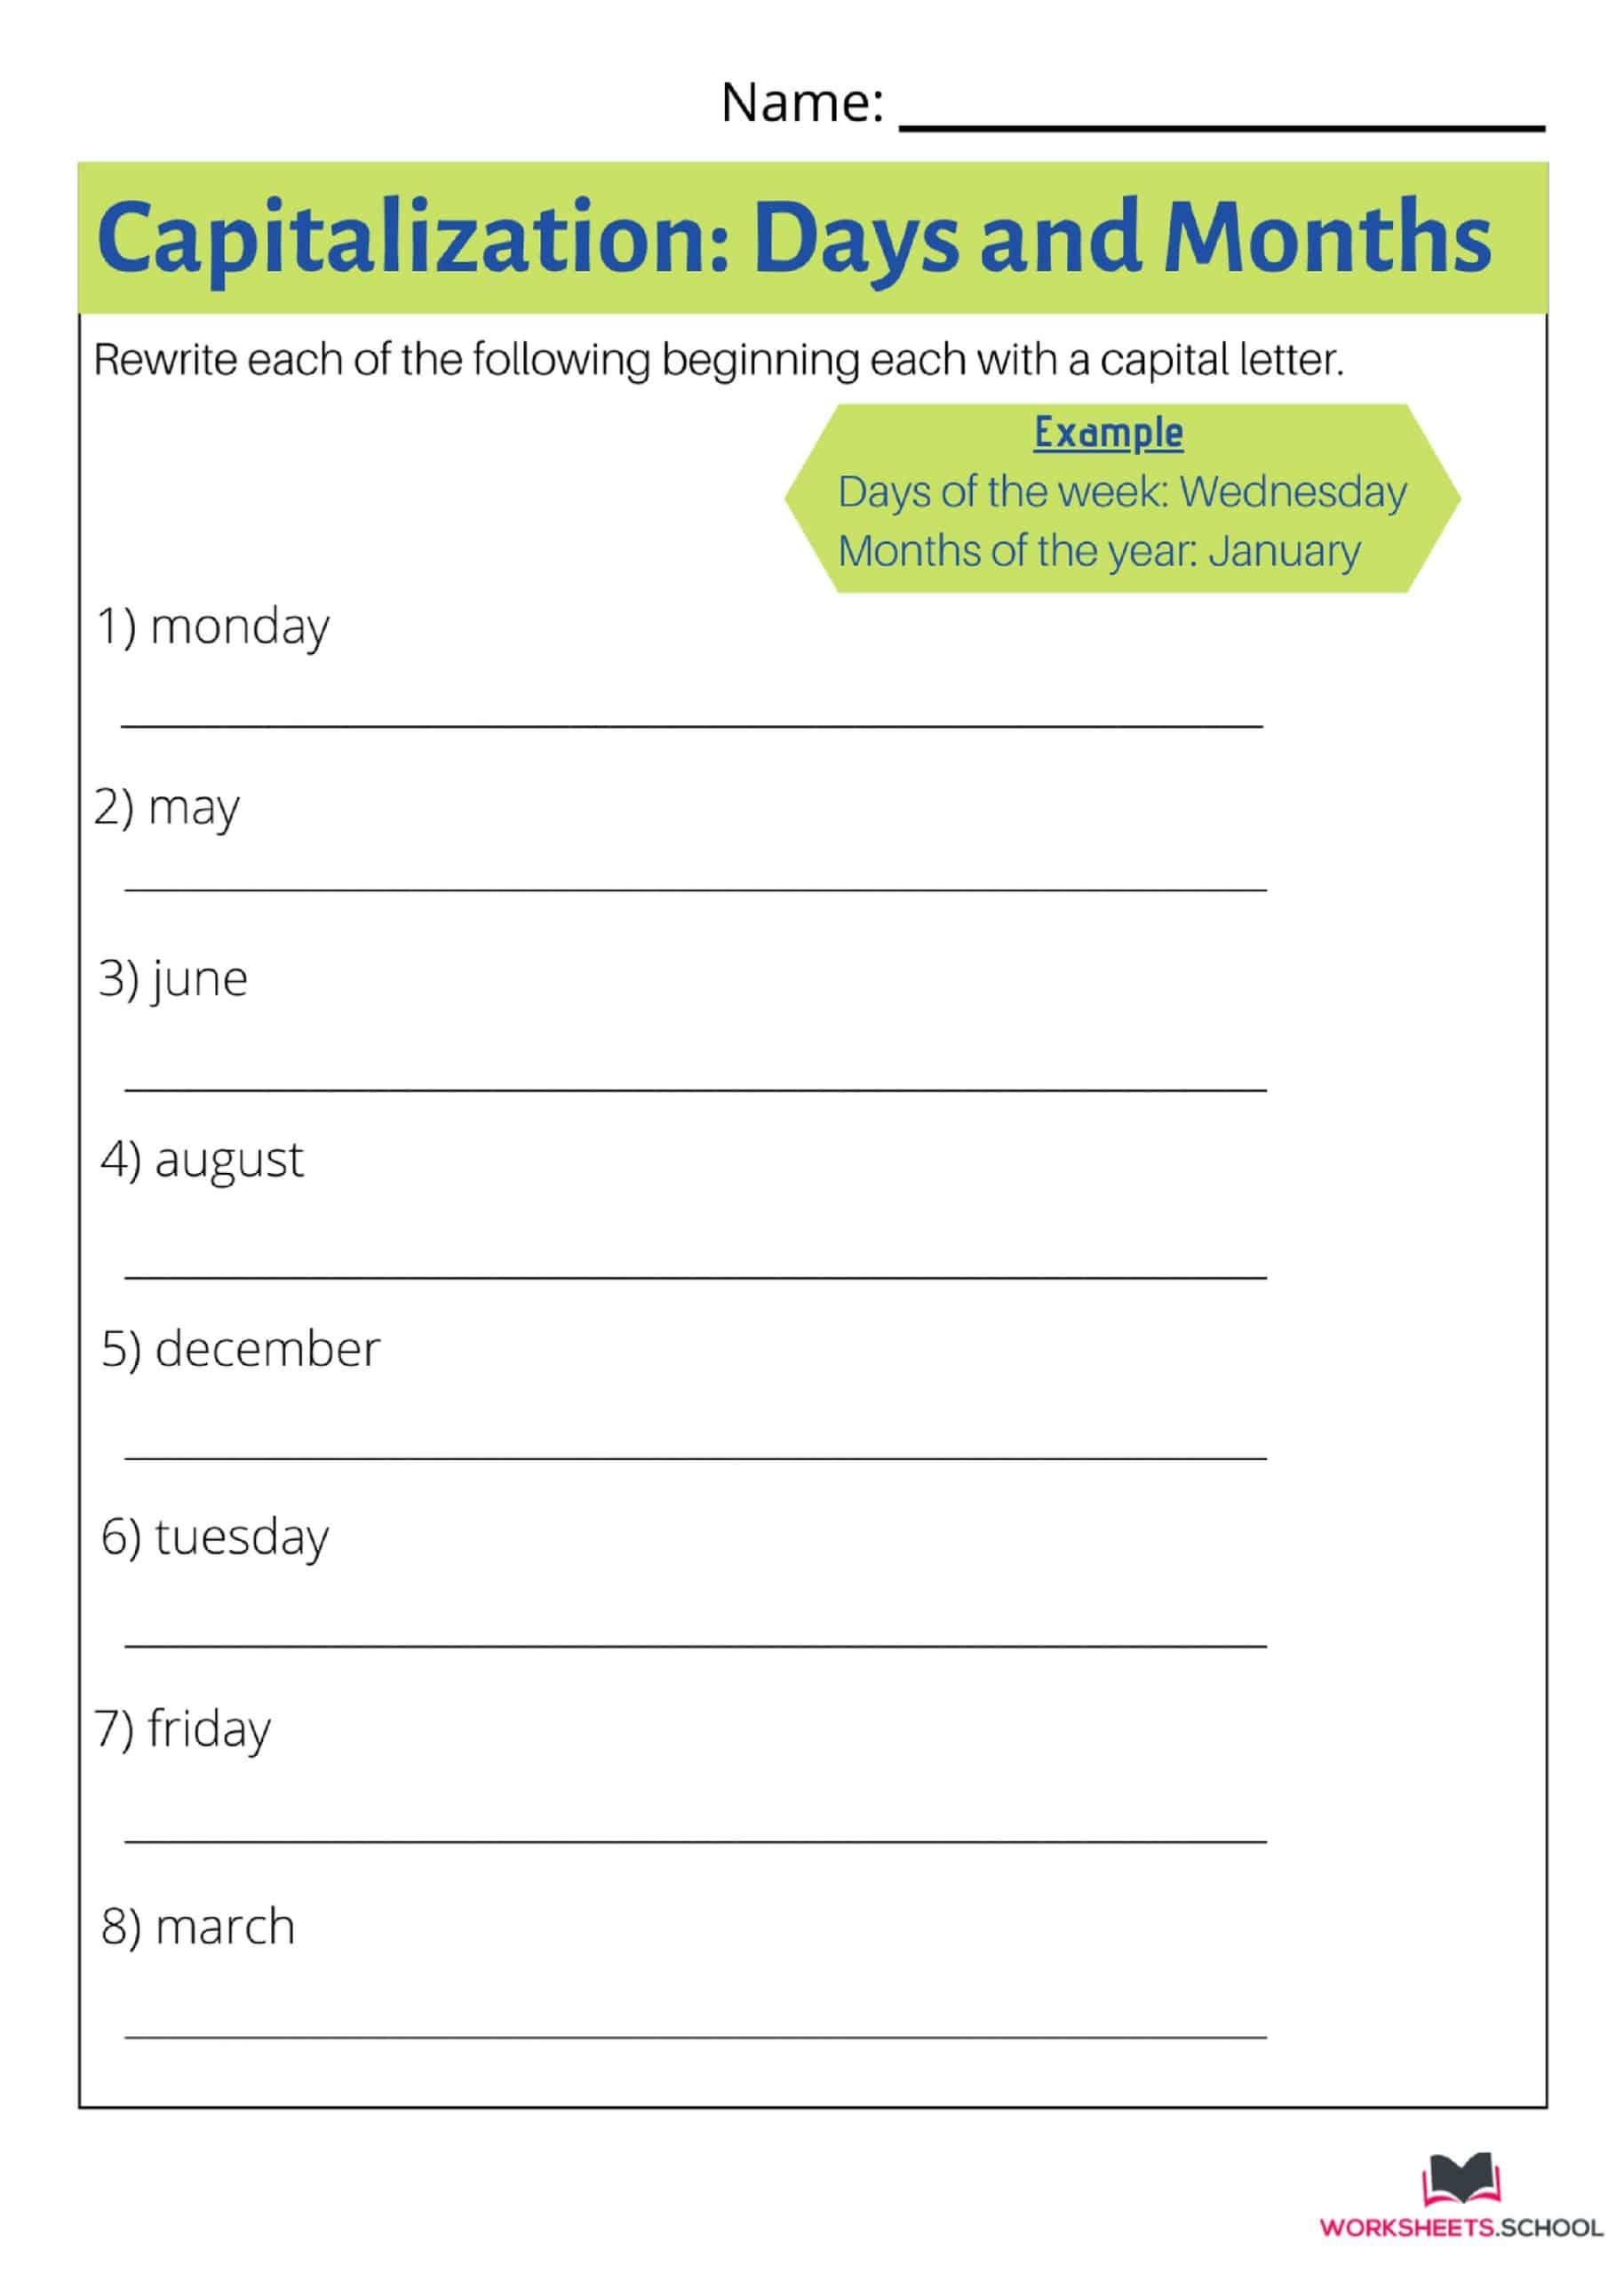 10 Awesome Capitalization Worksheets Worksheets Hool